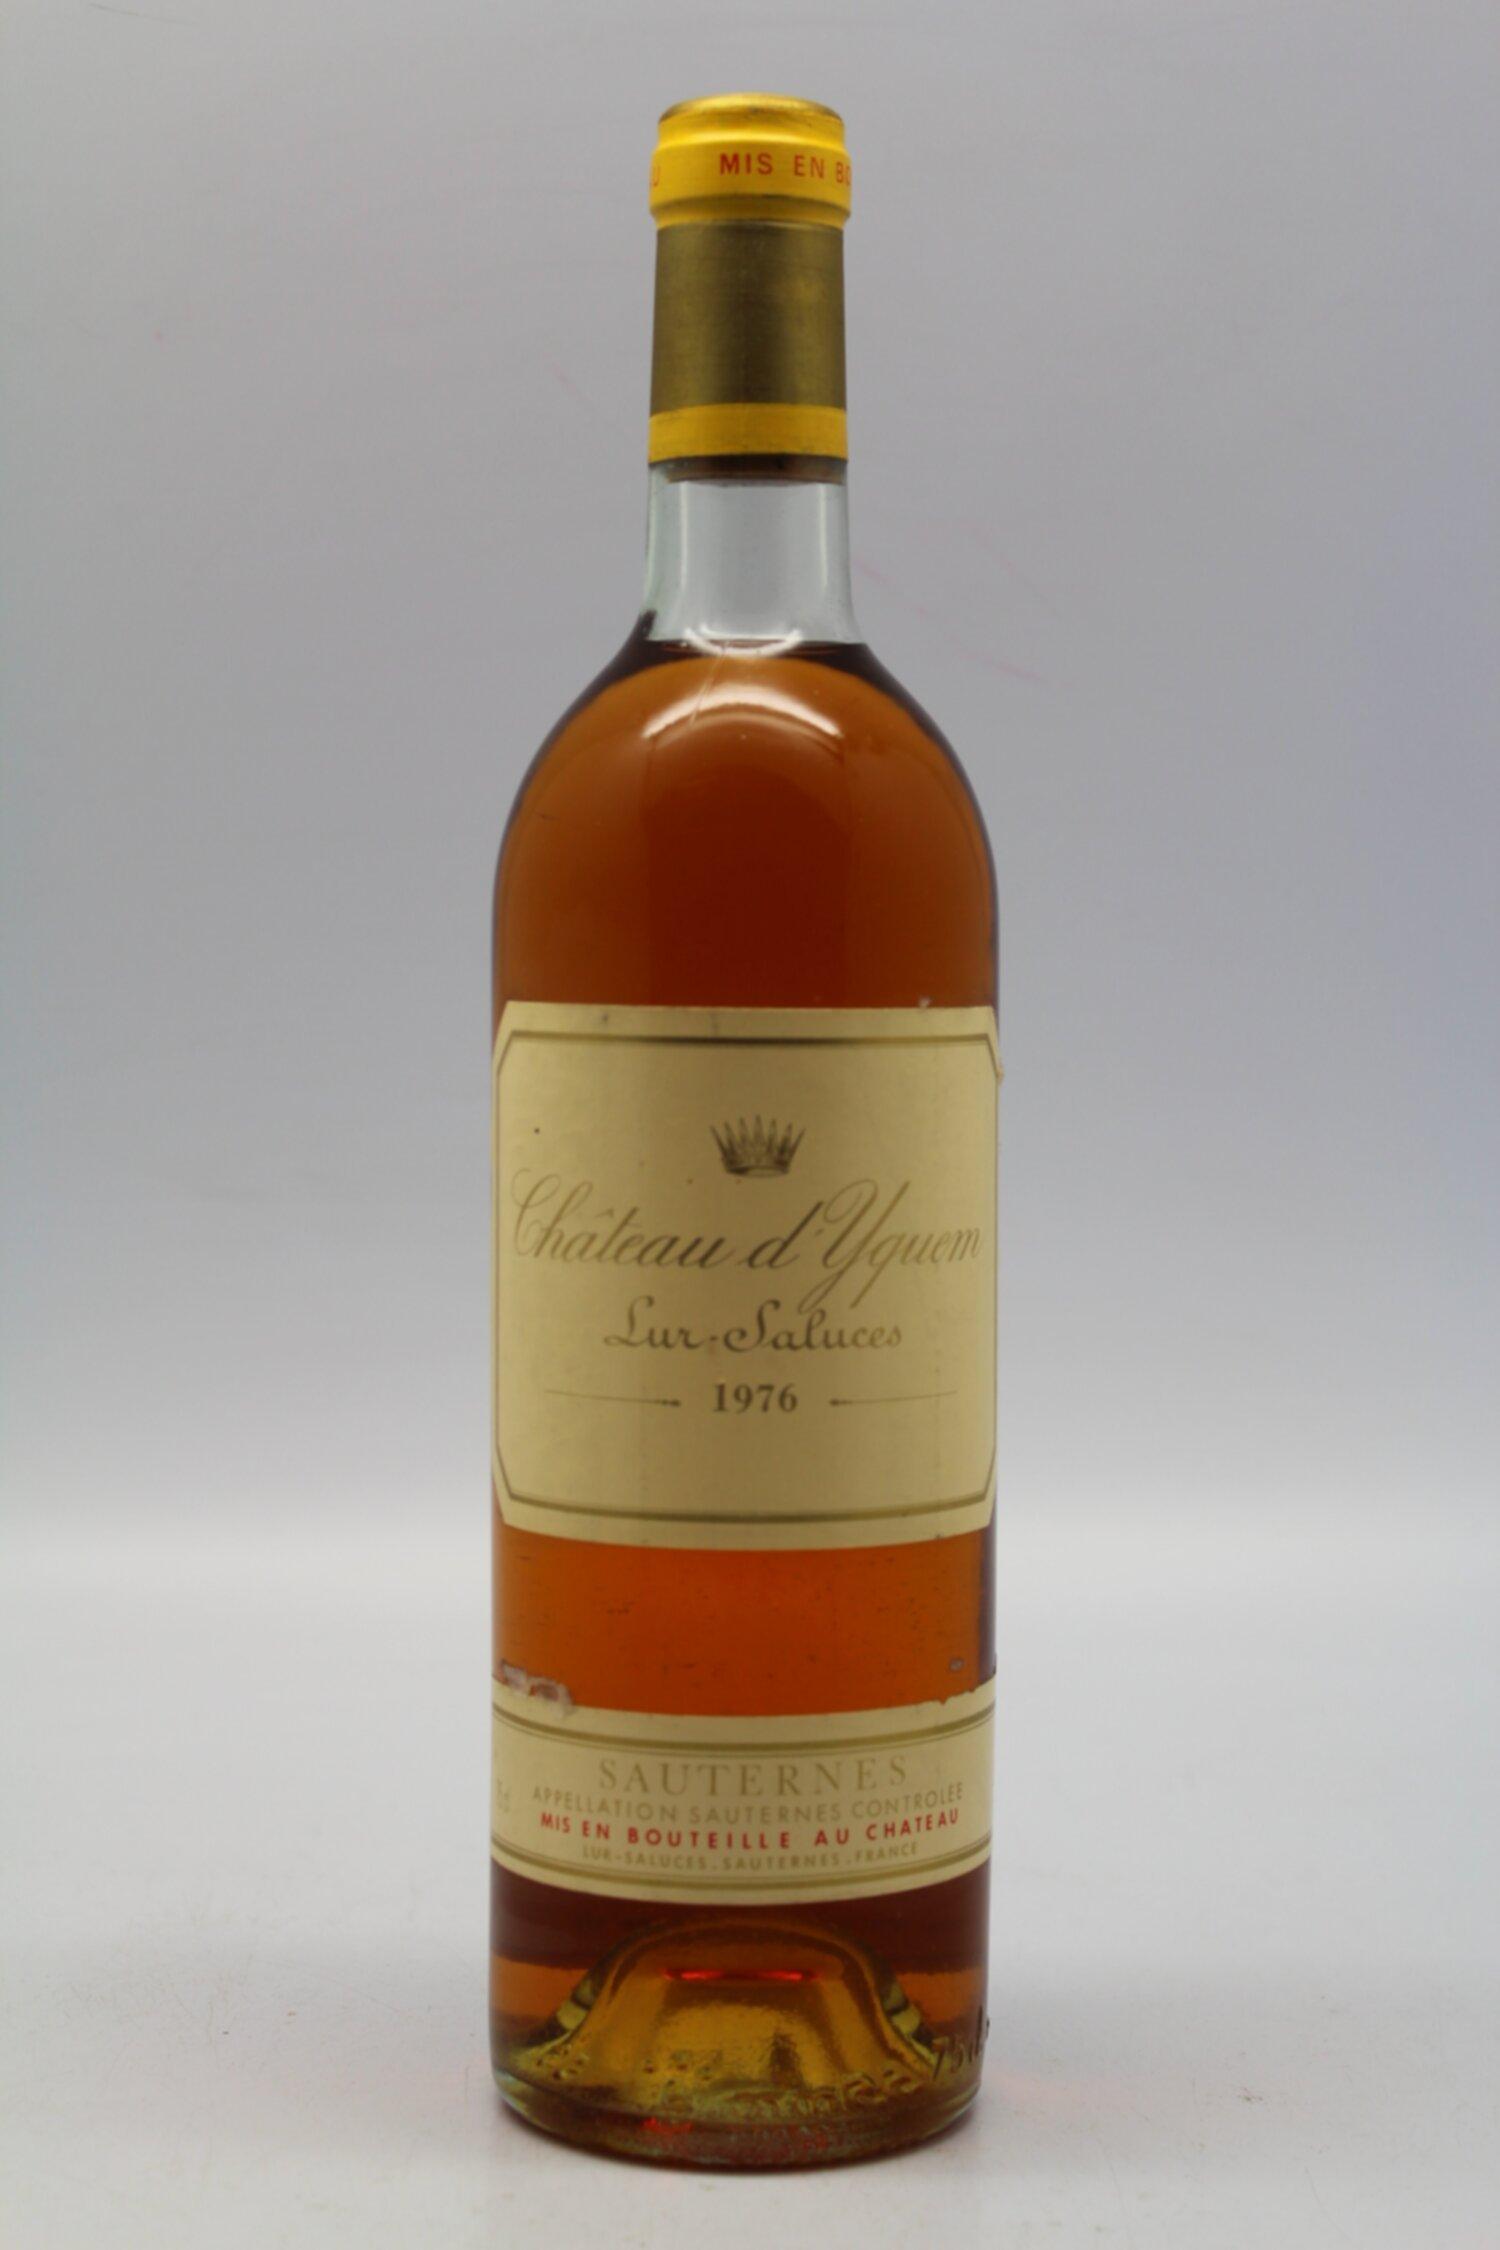 Yquem 1976 - VINS & MILLESIMES